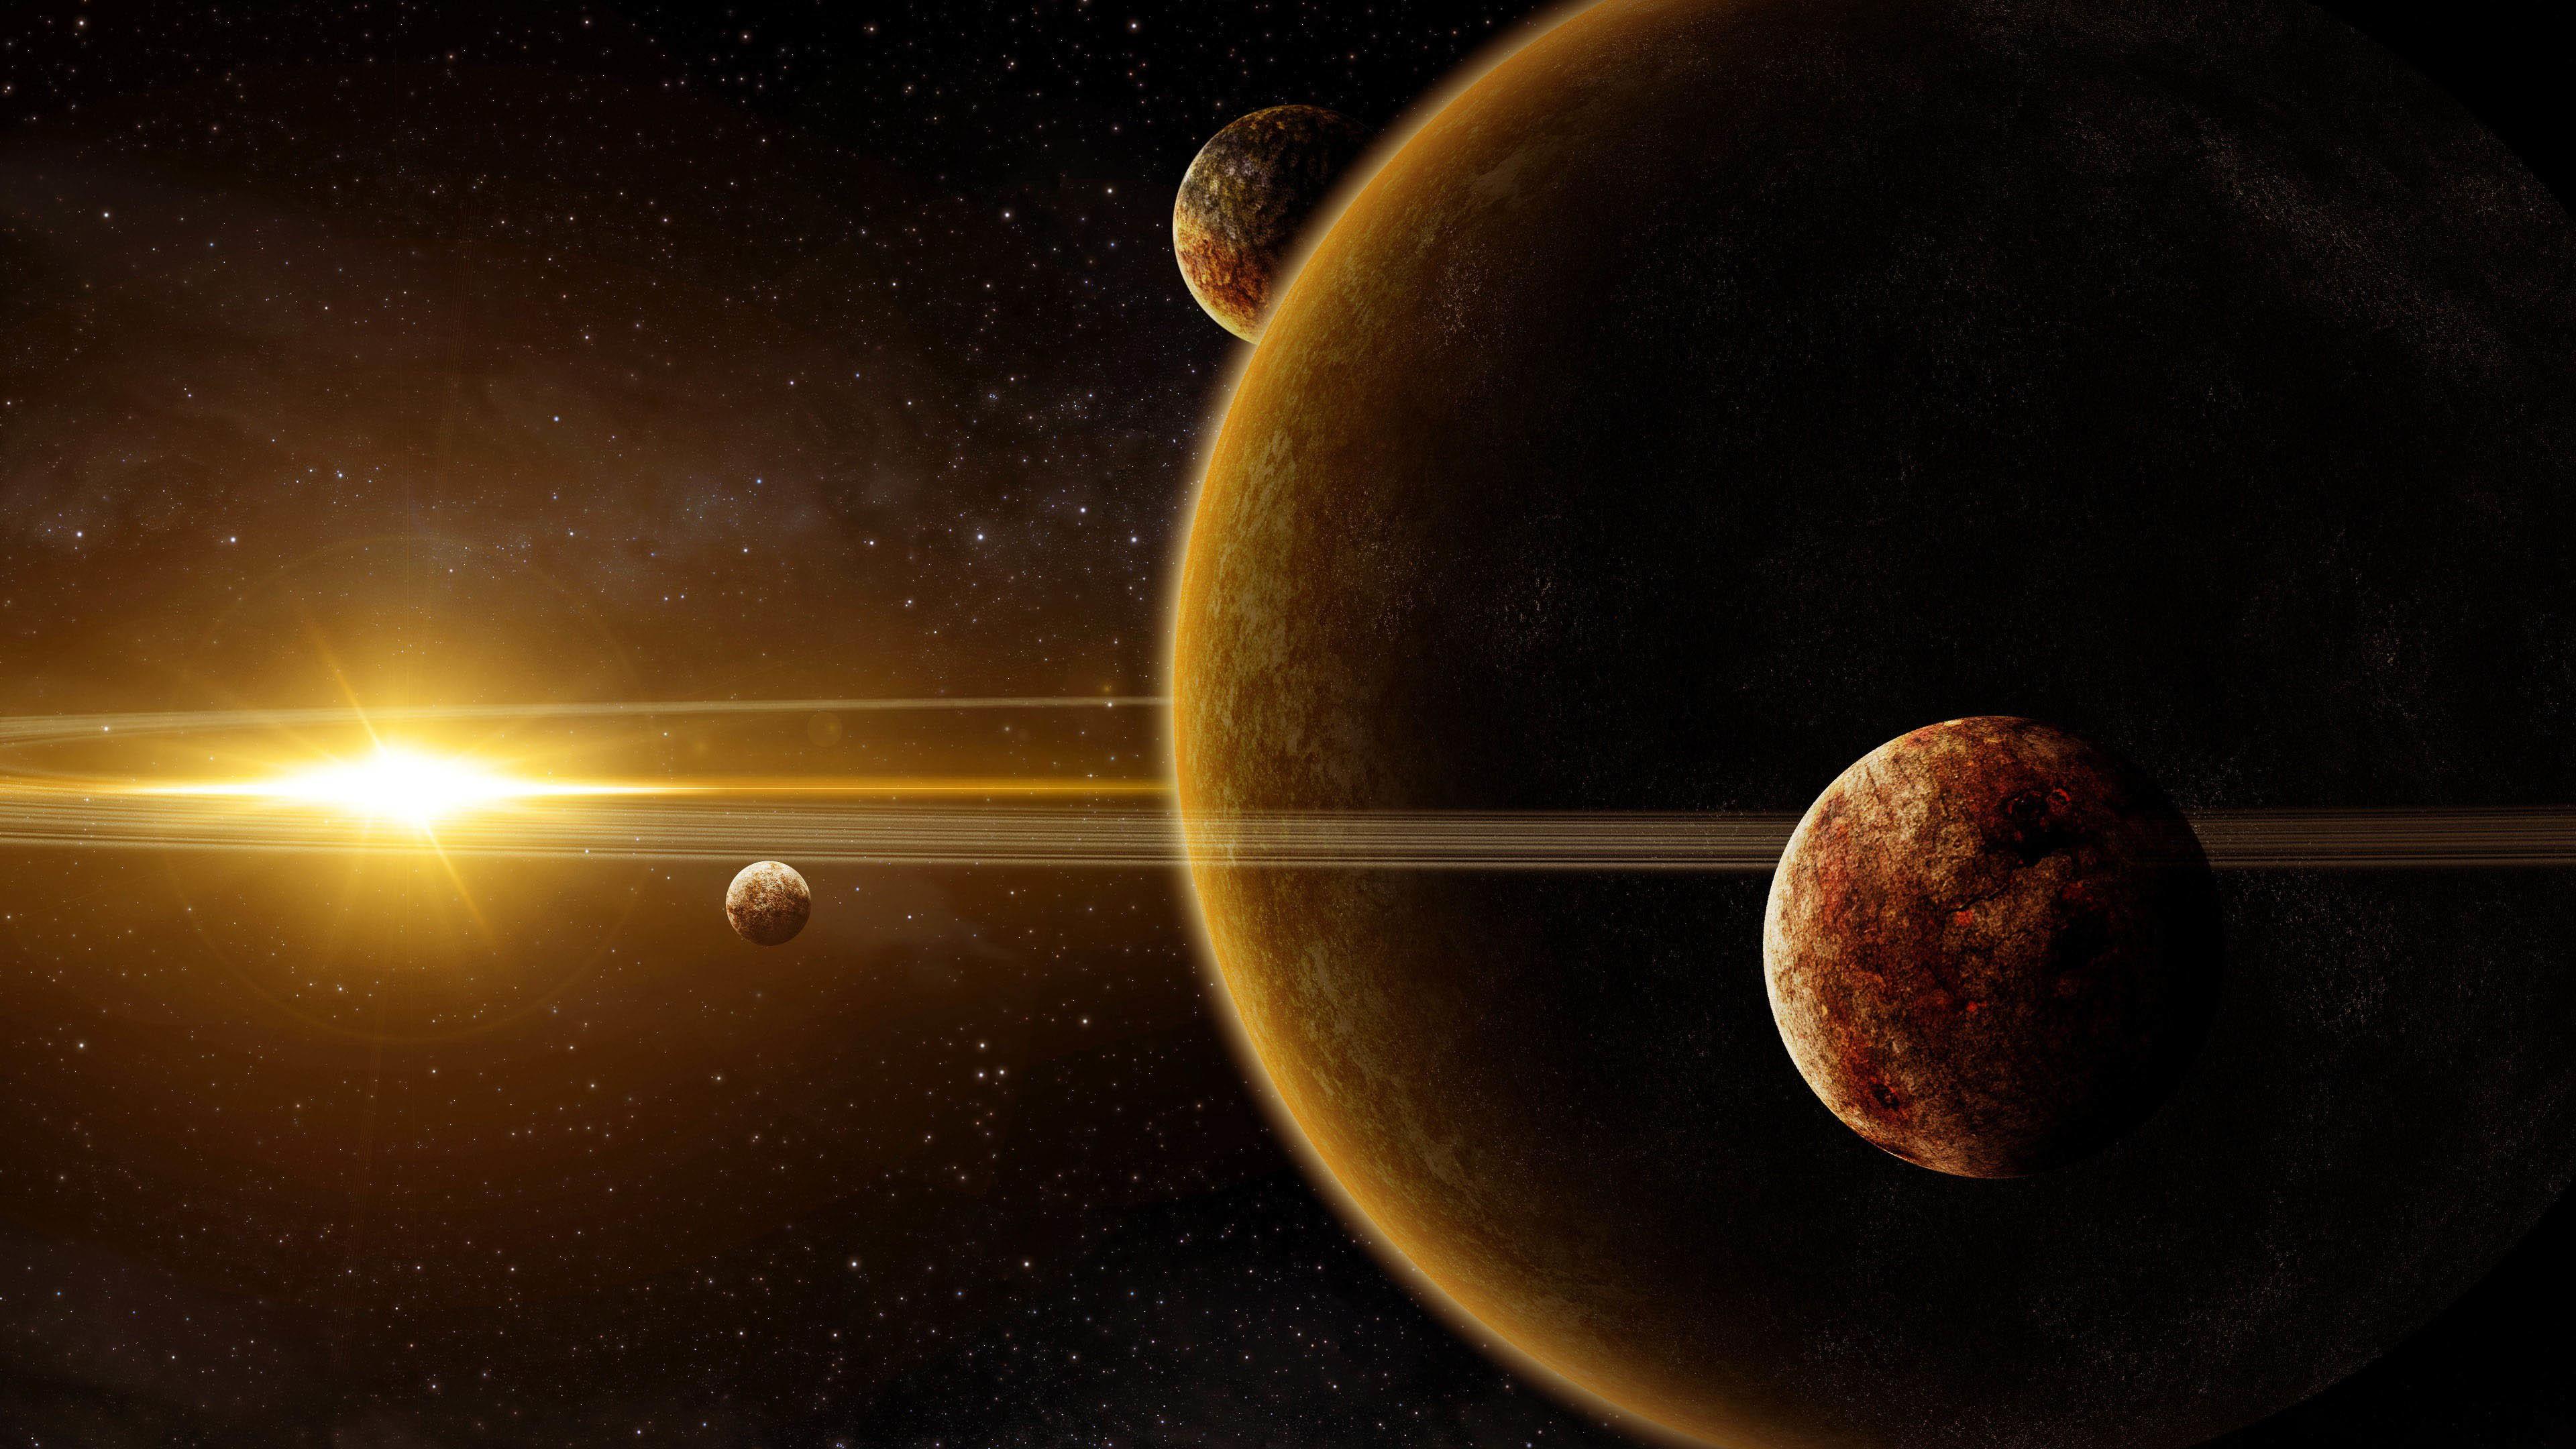 Beautiful Solar System wallpaper